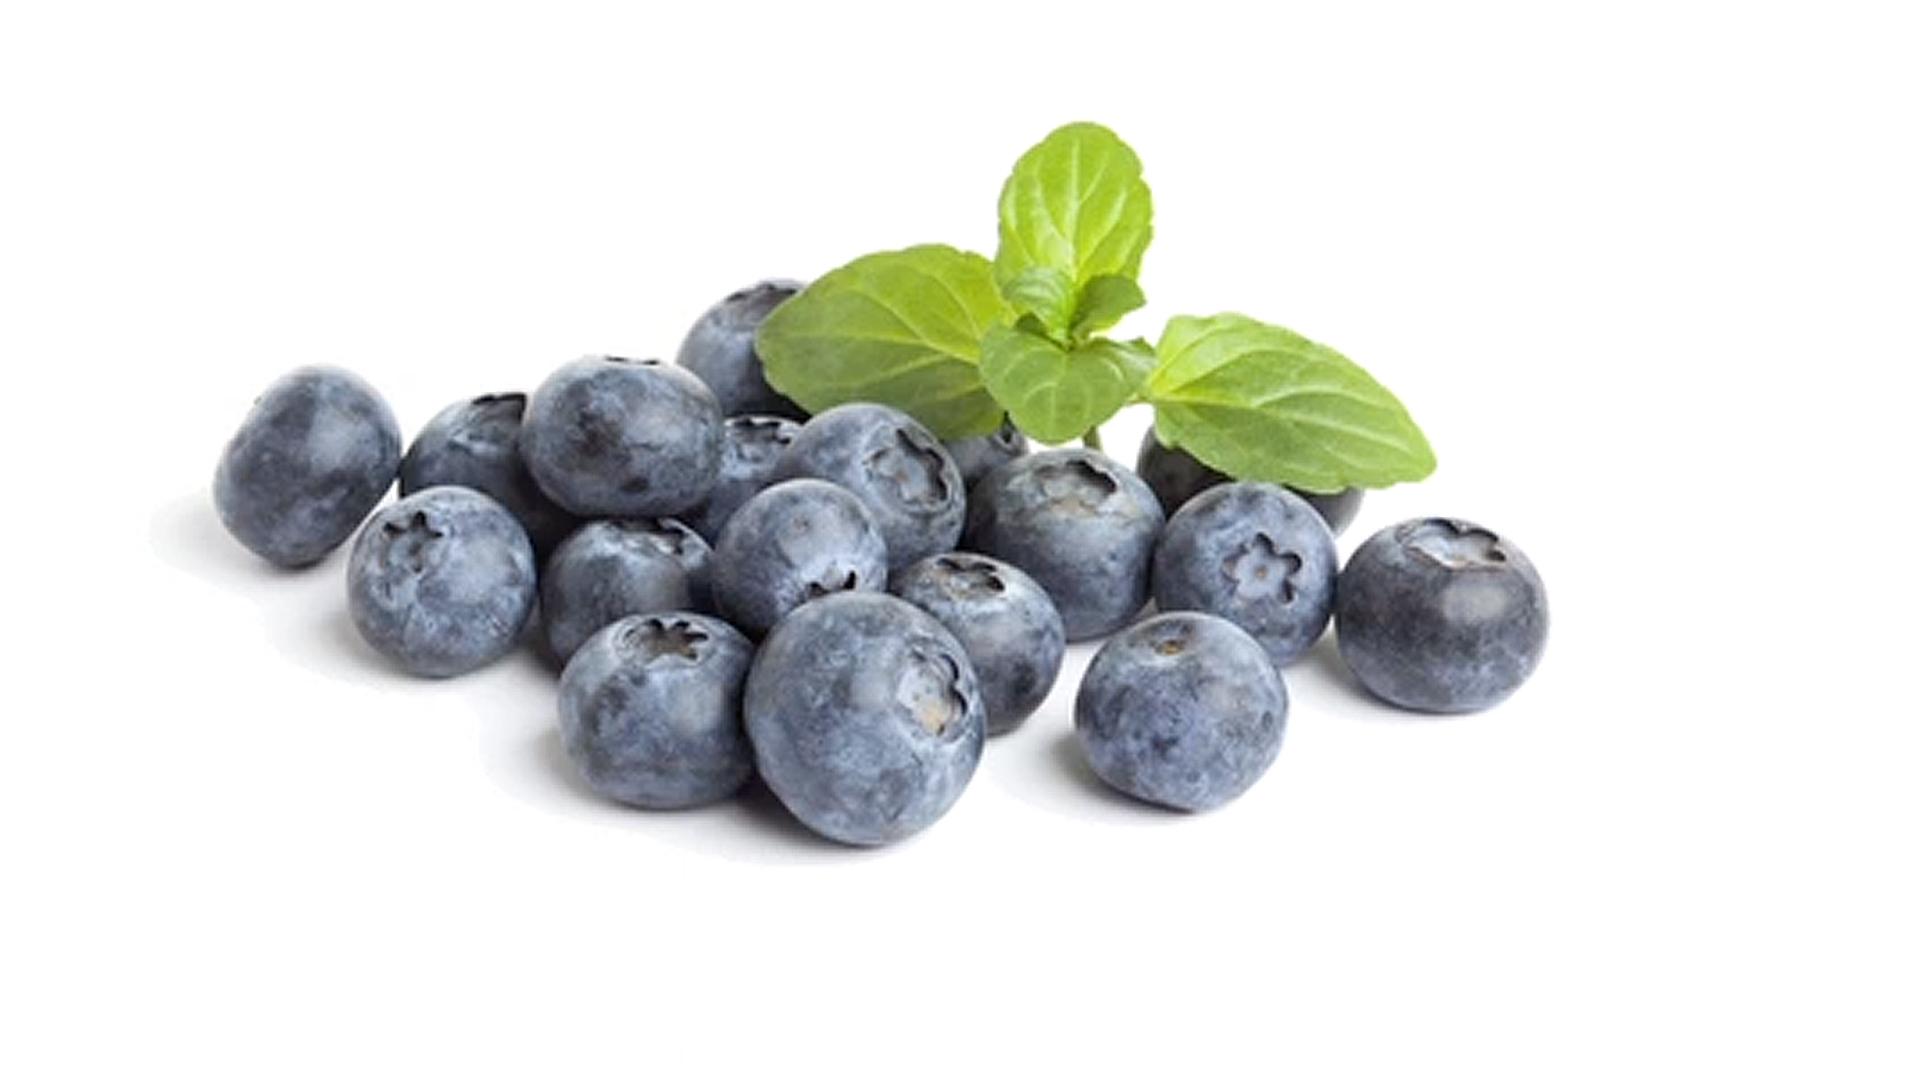 Eat Blueberries for Colon Health